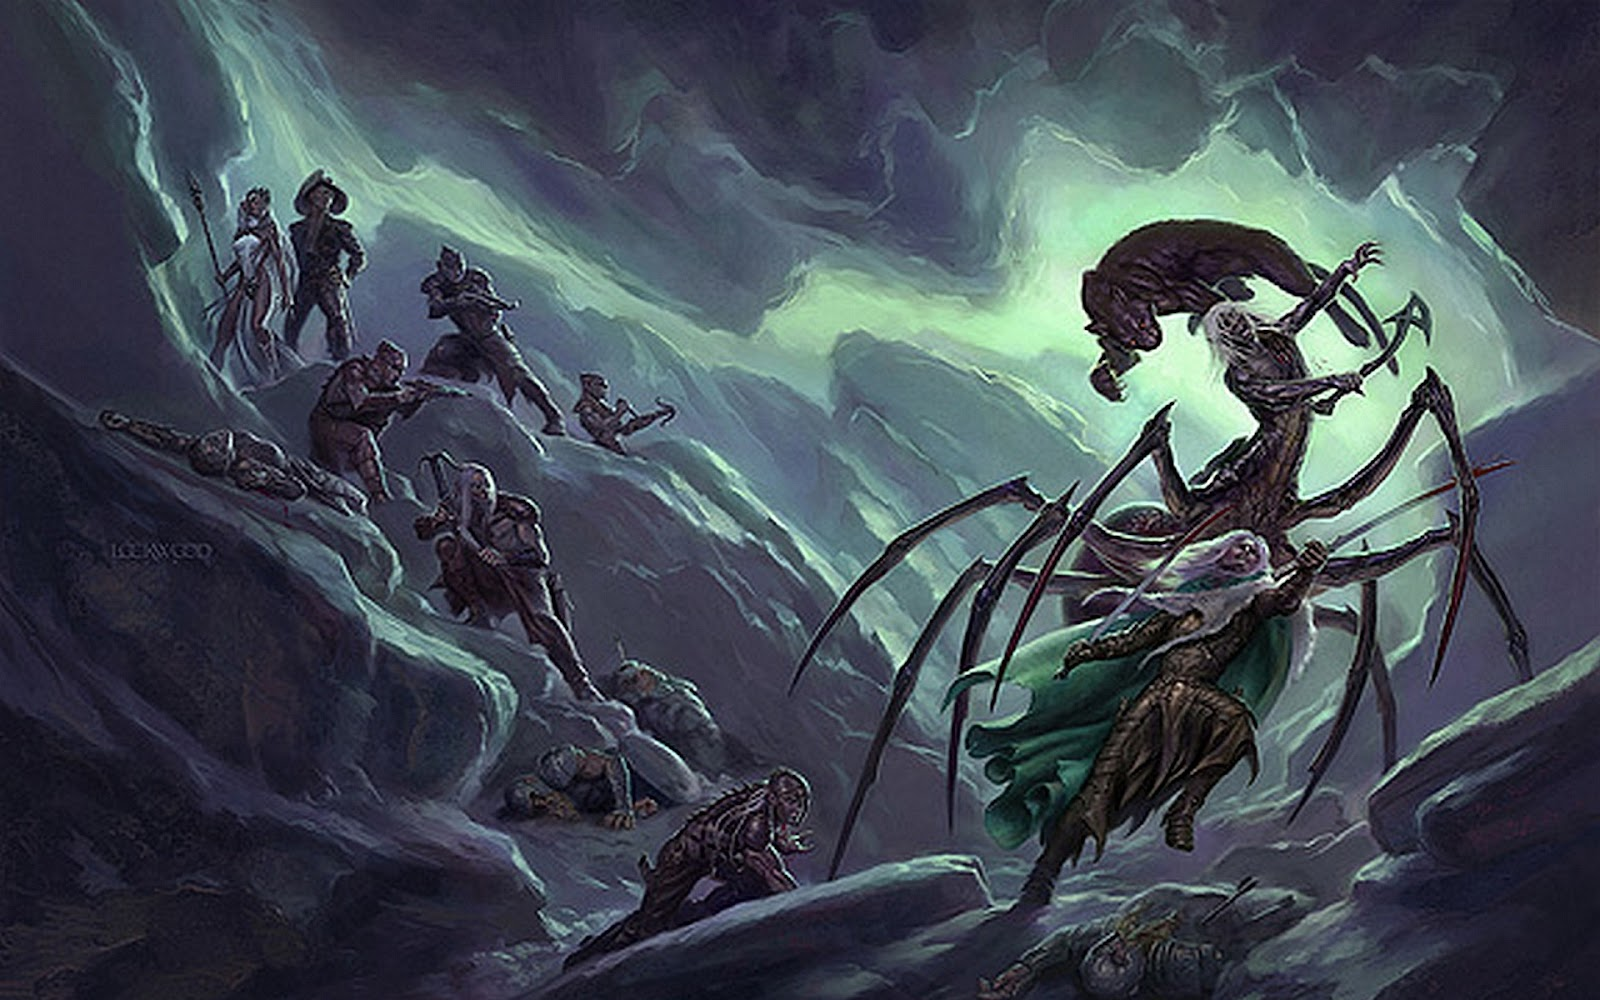 Forgotten realms dark elf girl hentai scenes